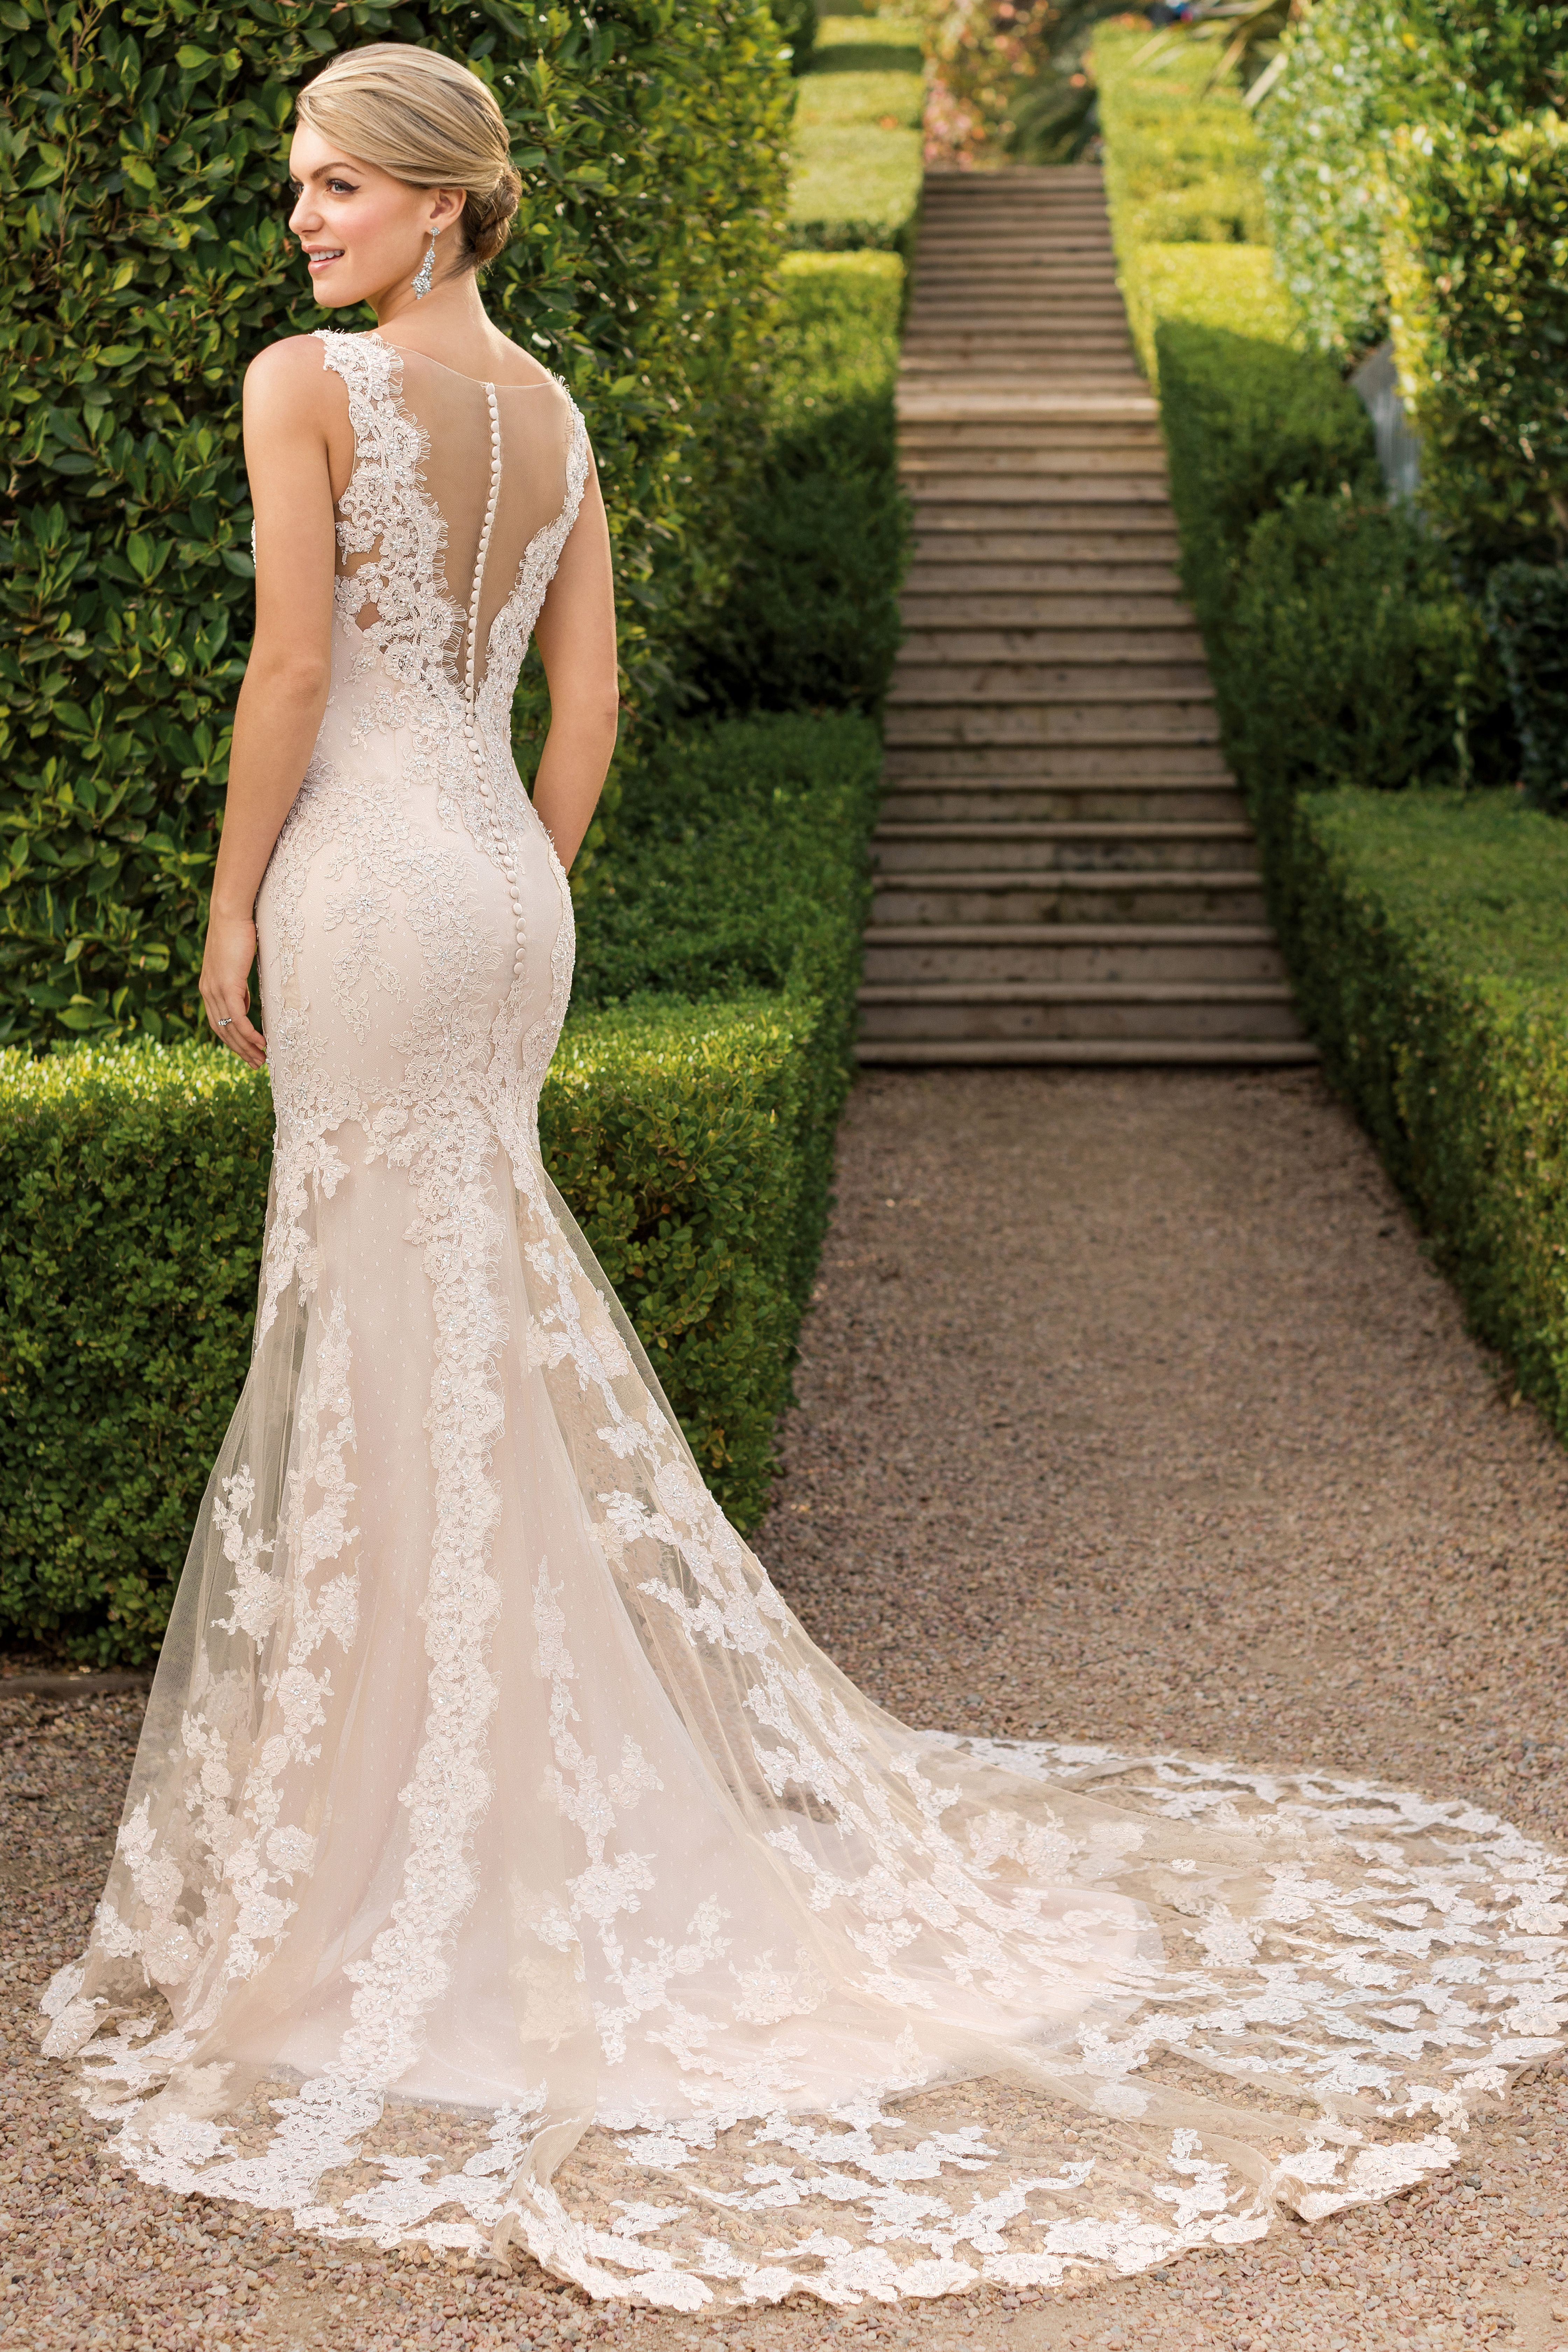 Casablanca 2343 Mockingbird Bridal Dallas Tx Bridal Gowns Bridesmaids Wedding Dresses Dallas Texas Fit And Flare Wedding Dress Casablanca Bridal Gowns Perfect Wedding Dress